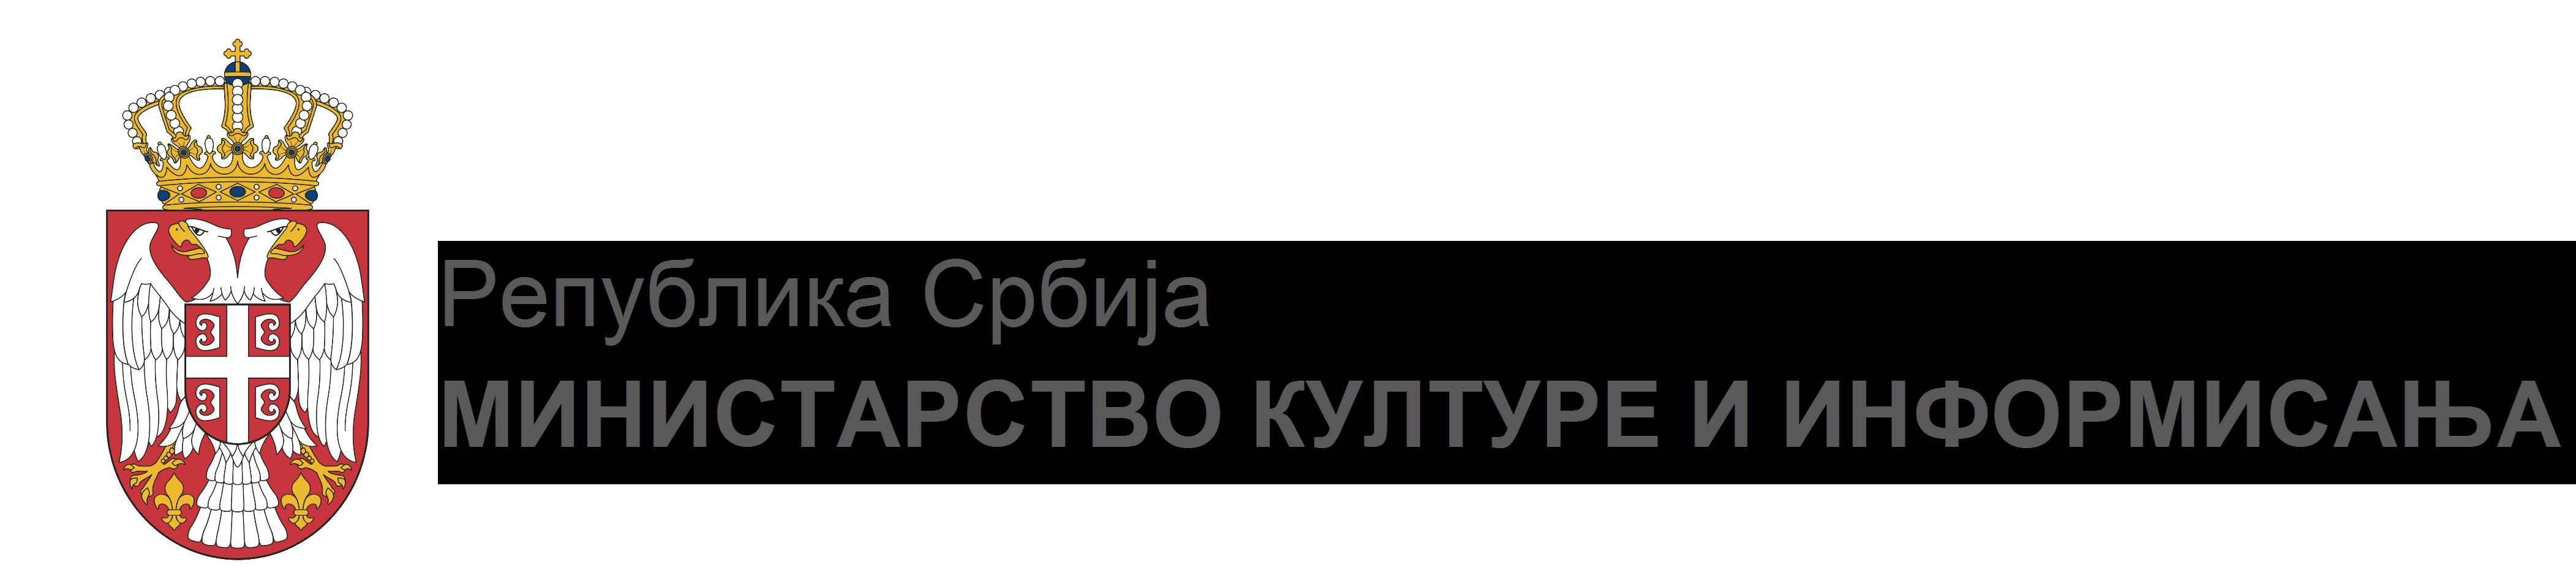 Ministarstvo kulture i informisanja RS